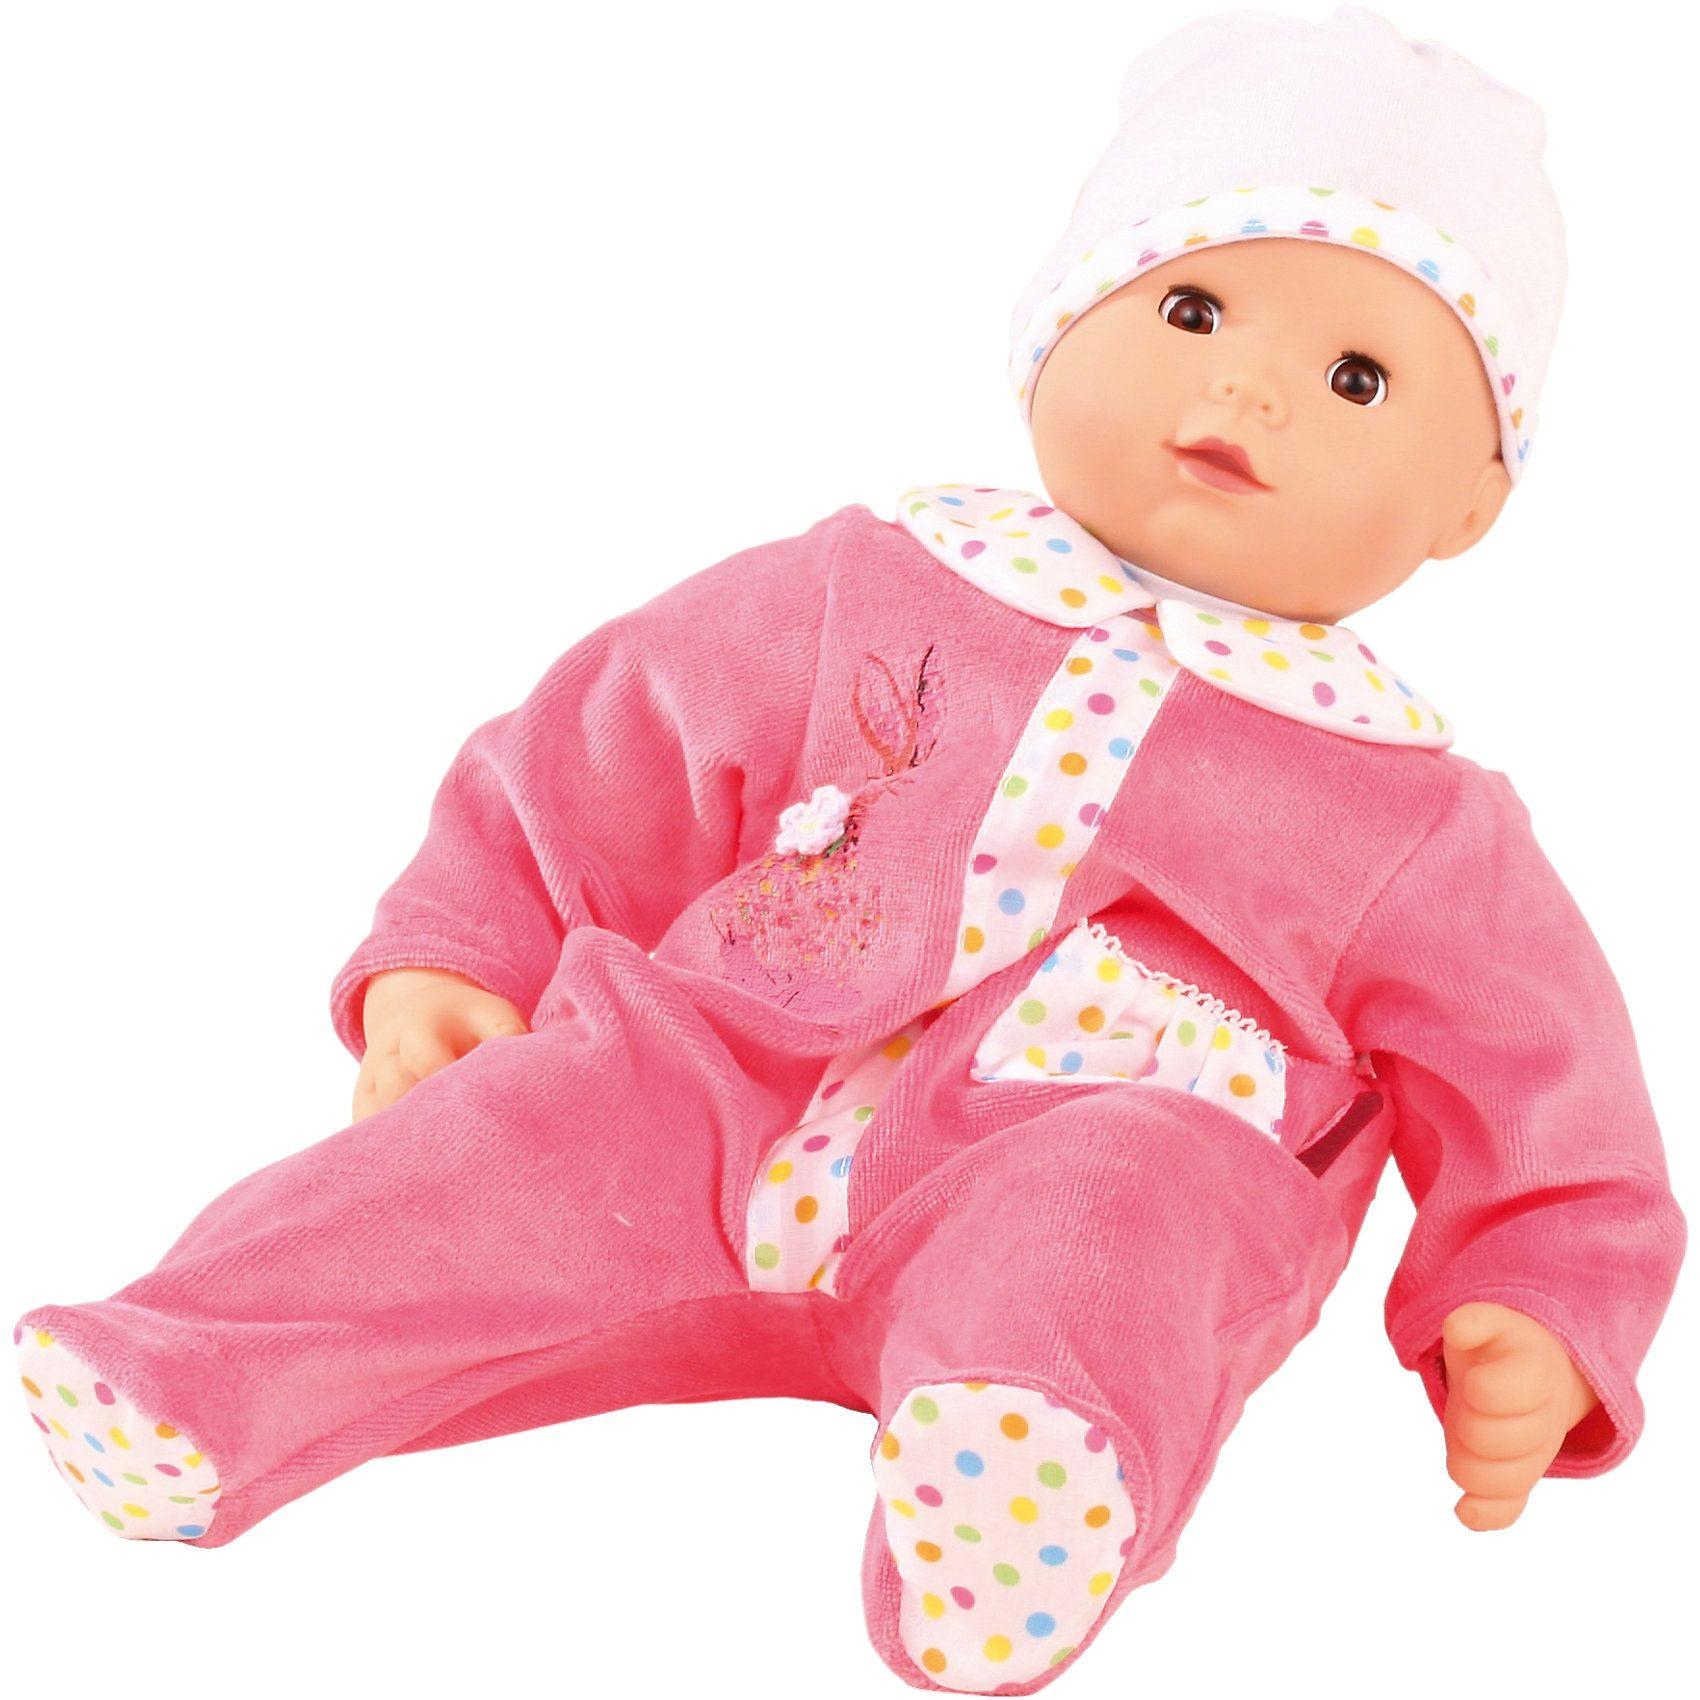 Götz Babypuppe Maxy Muffin, 42cm